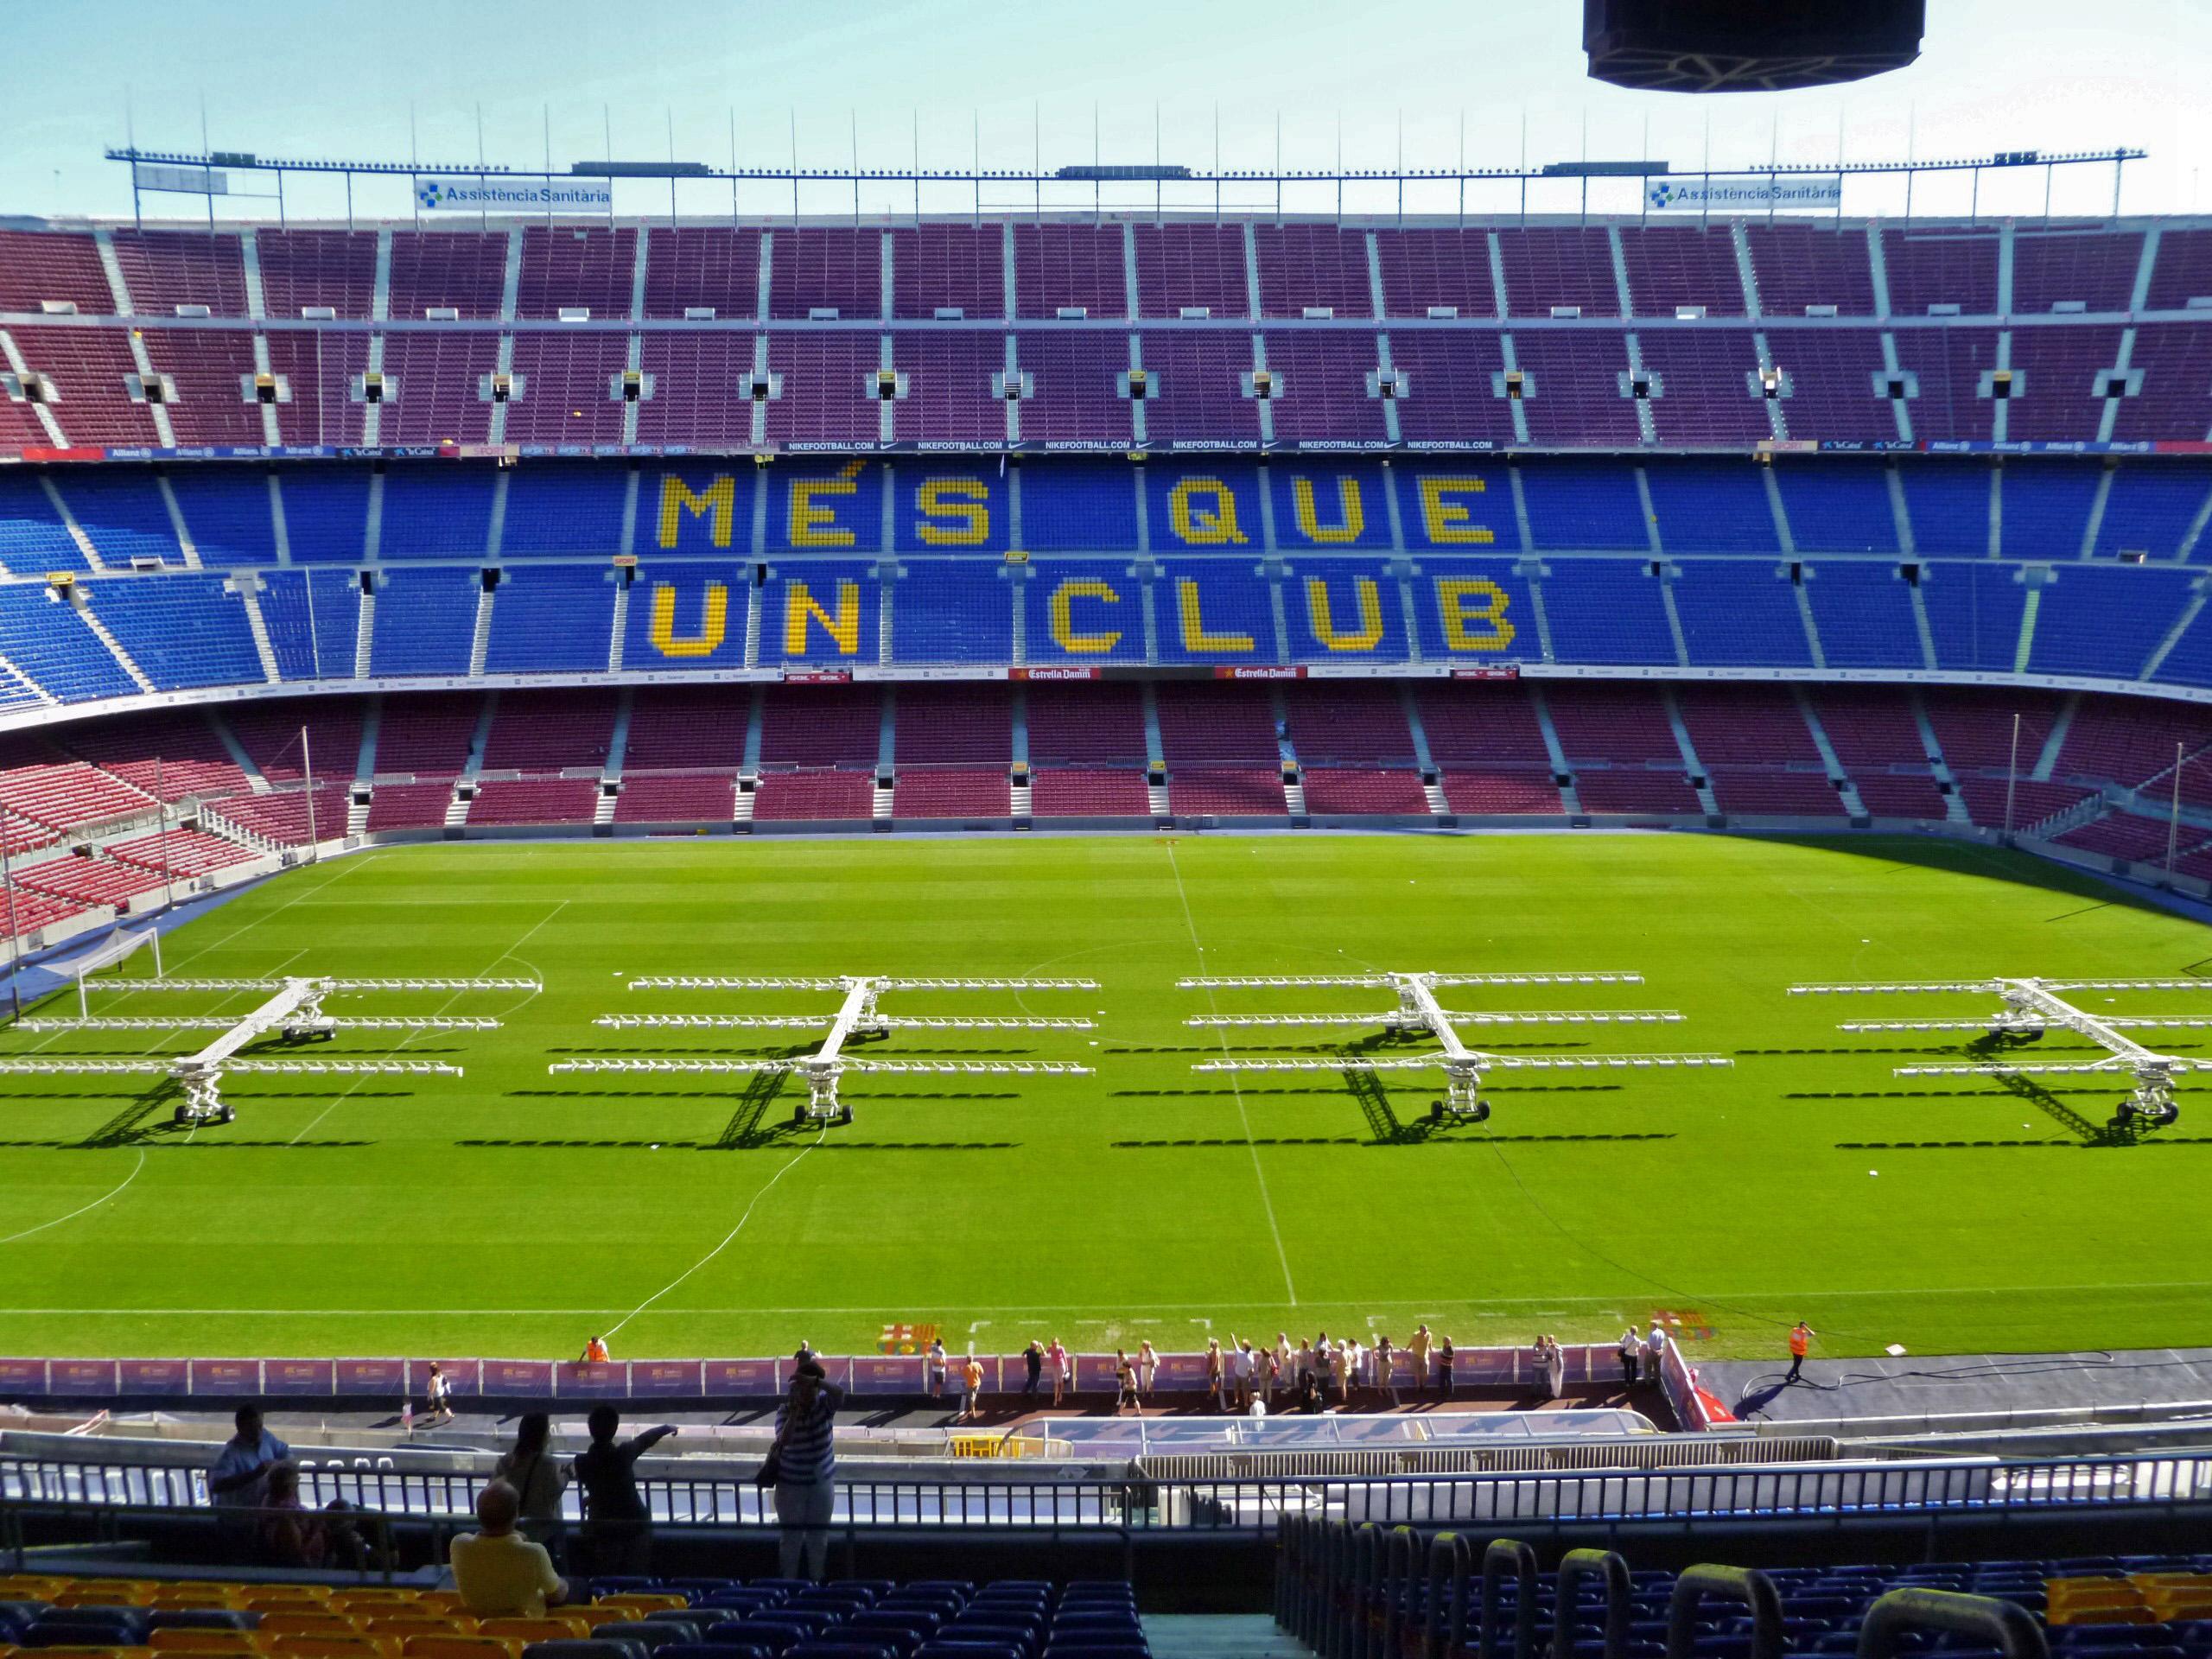 Стадион в испании команда барселона